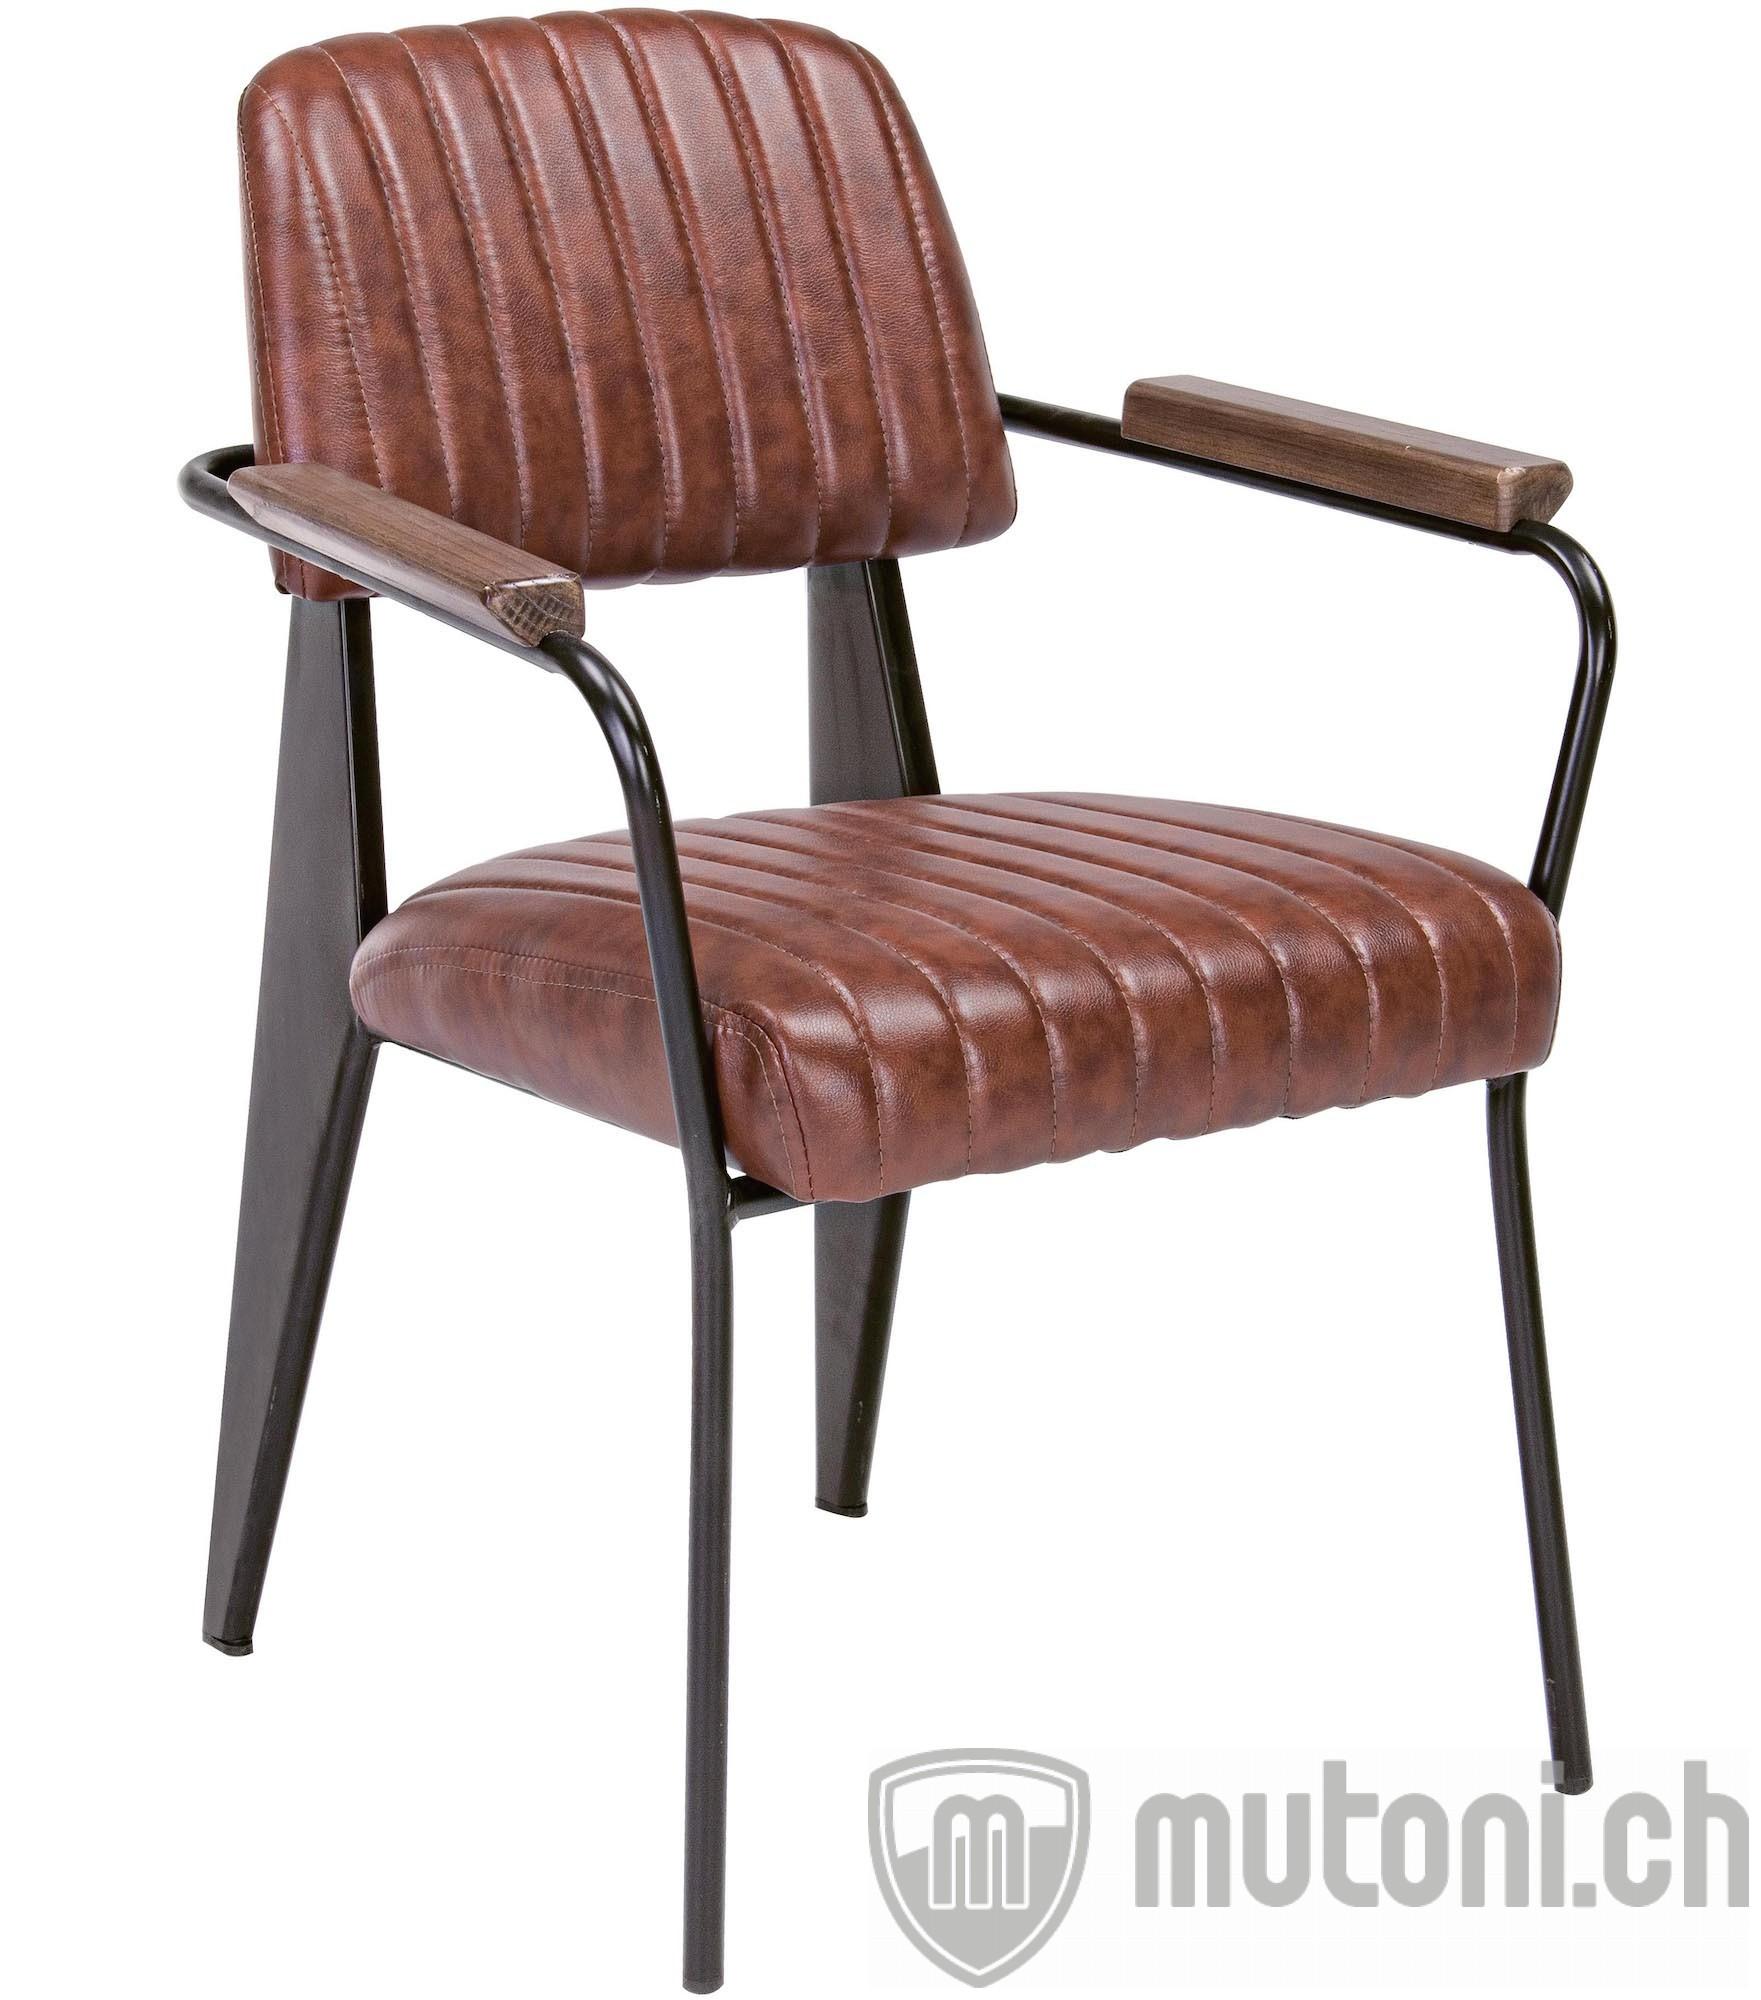 armlehnstuhl nelly vintage braun mutoni lifestyle mutoni m bel. Black Bedroom Furniture Sets. Home Design Ideas